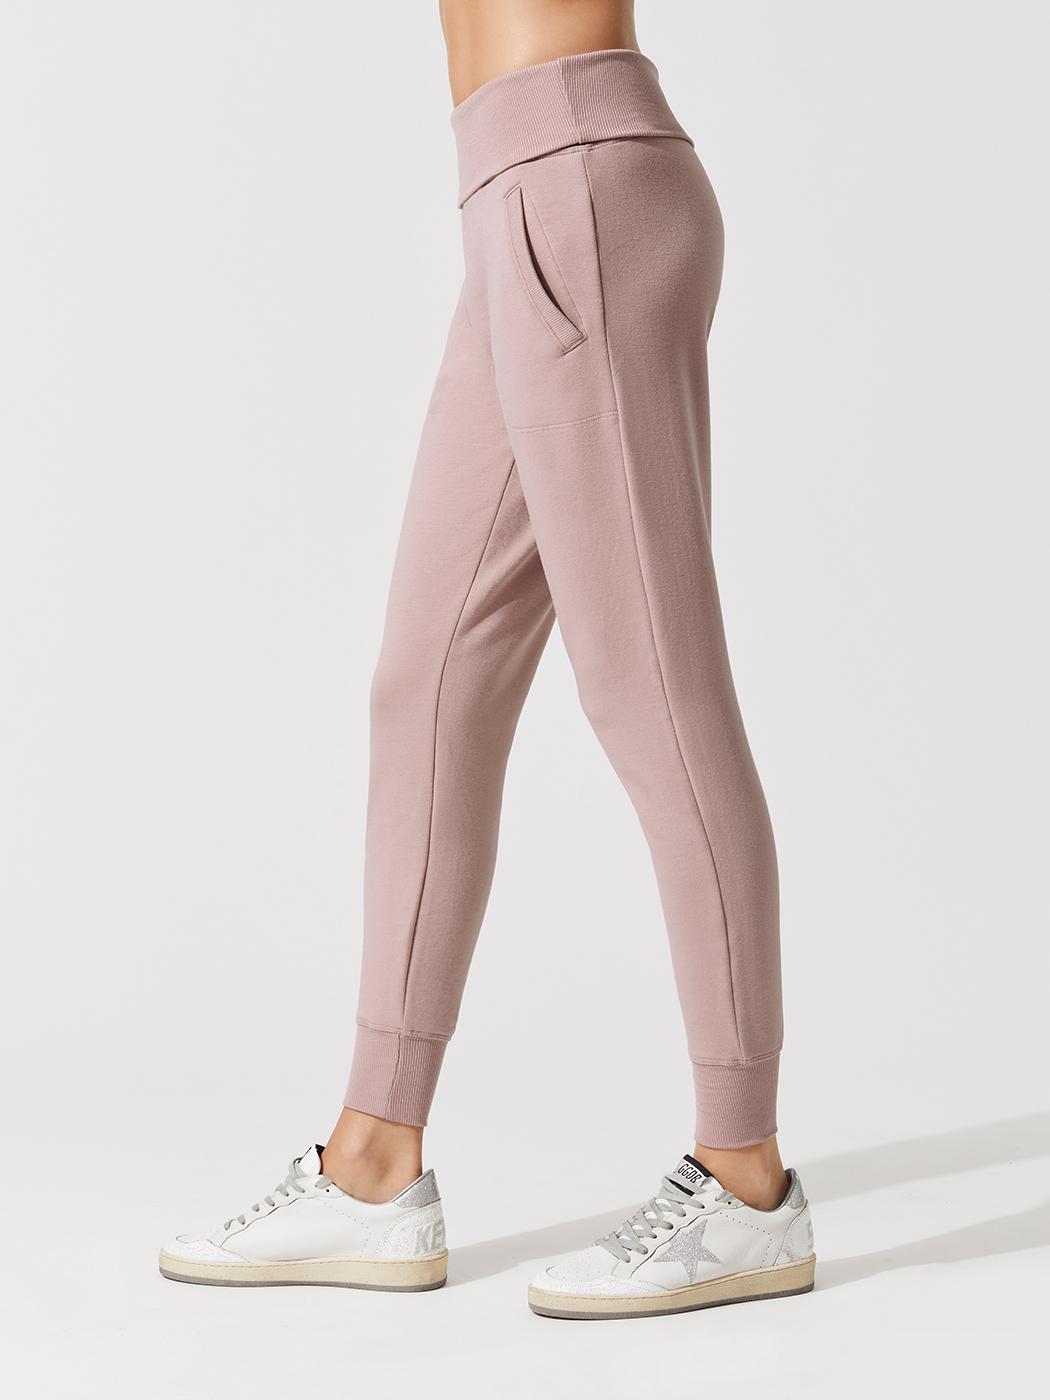 d89d8c7567 Beyond Yoga COZY FLEECE FOLDOVER LONG SWEATPANT - Brazen blush - Fashion  Activewear Dance Clothing Company